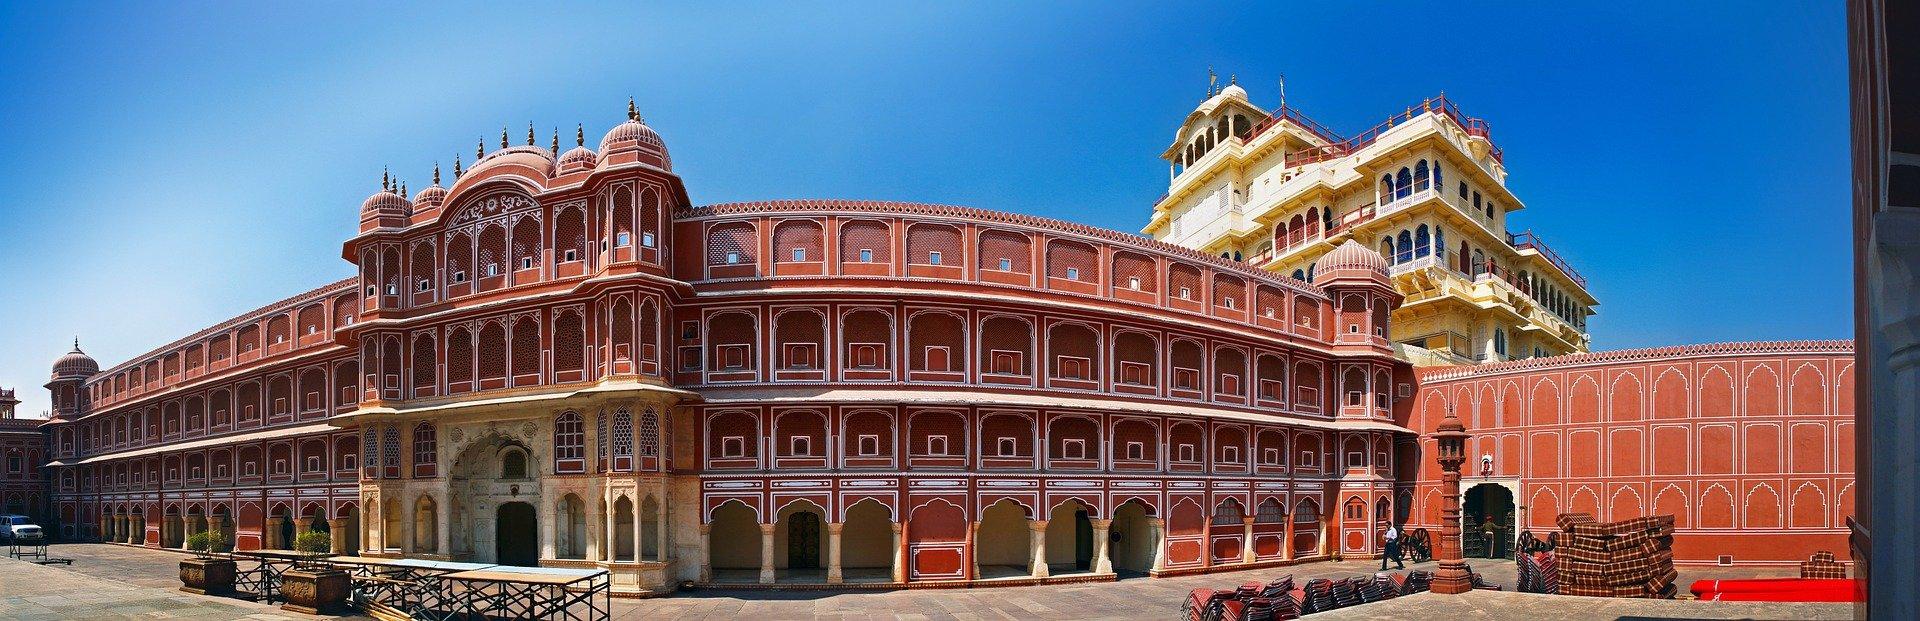 Tour the City Palace, Jaipur